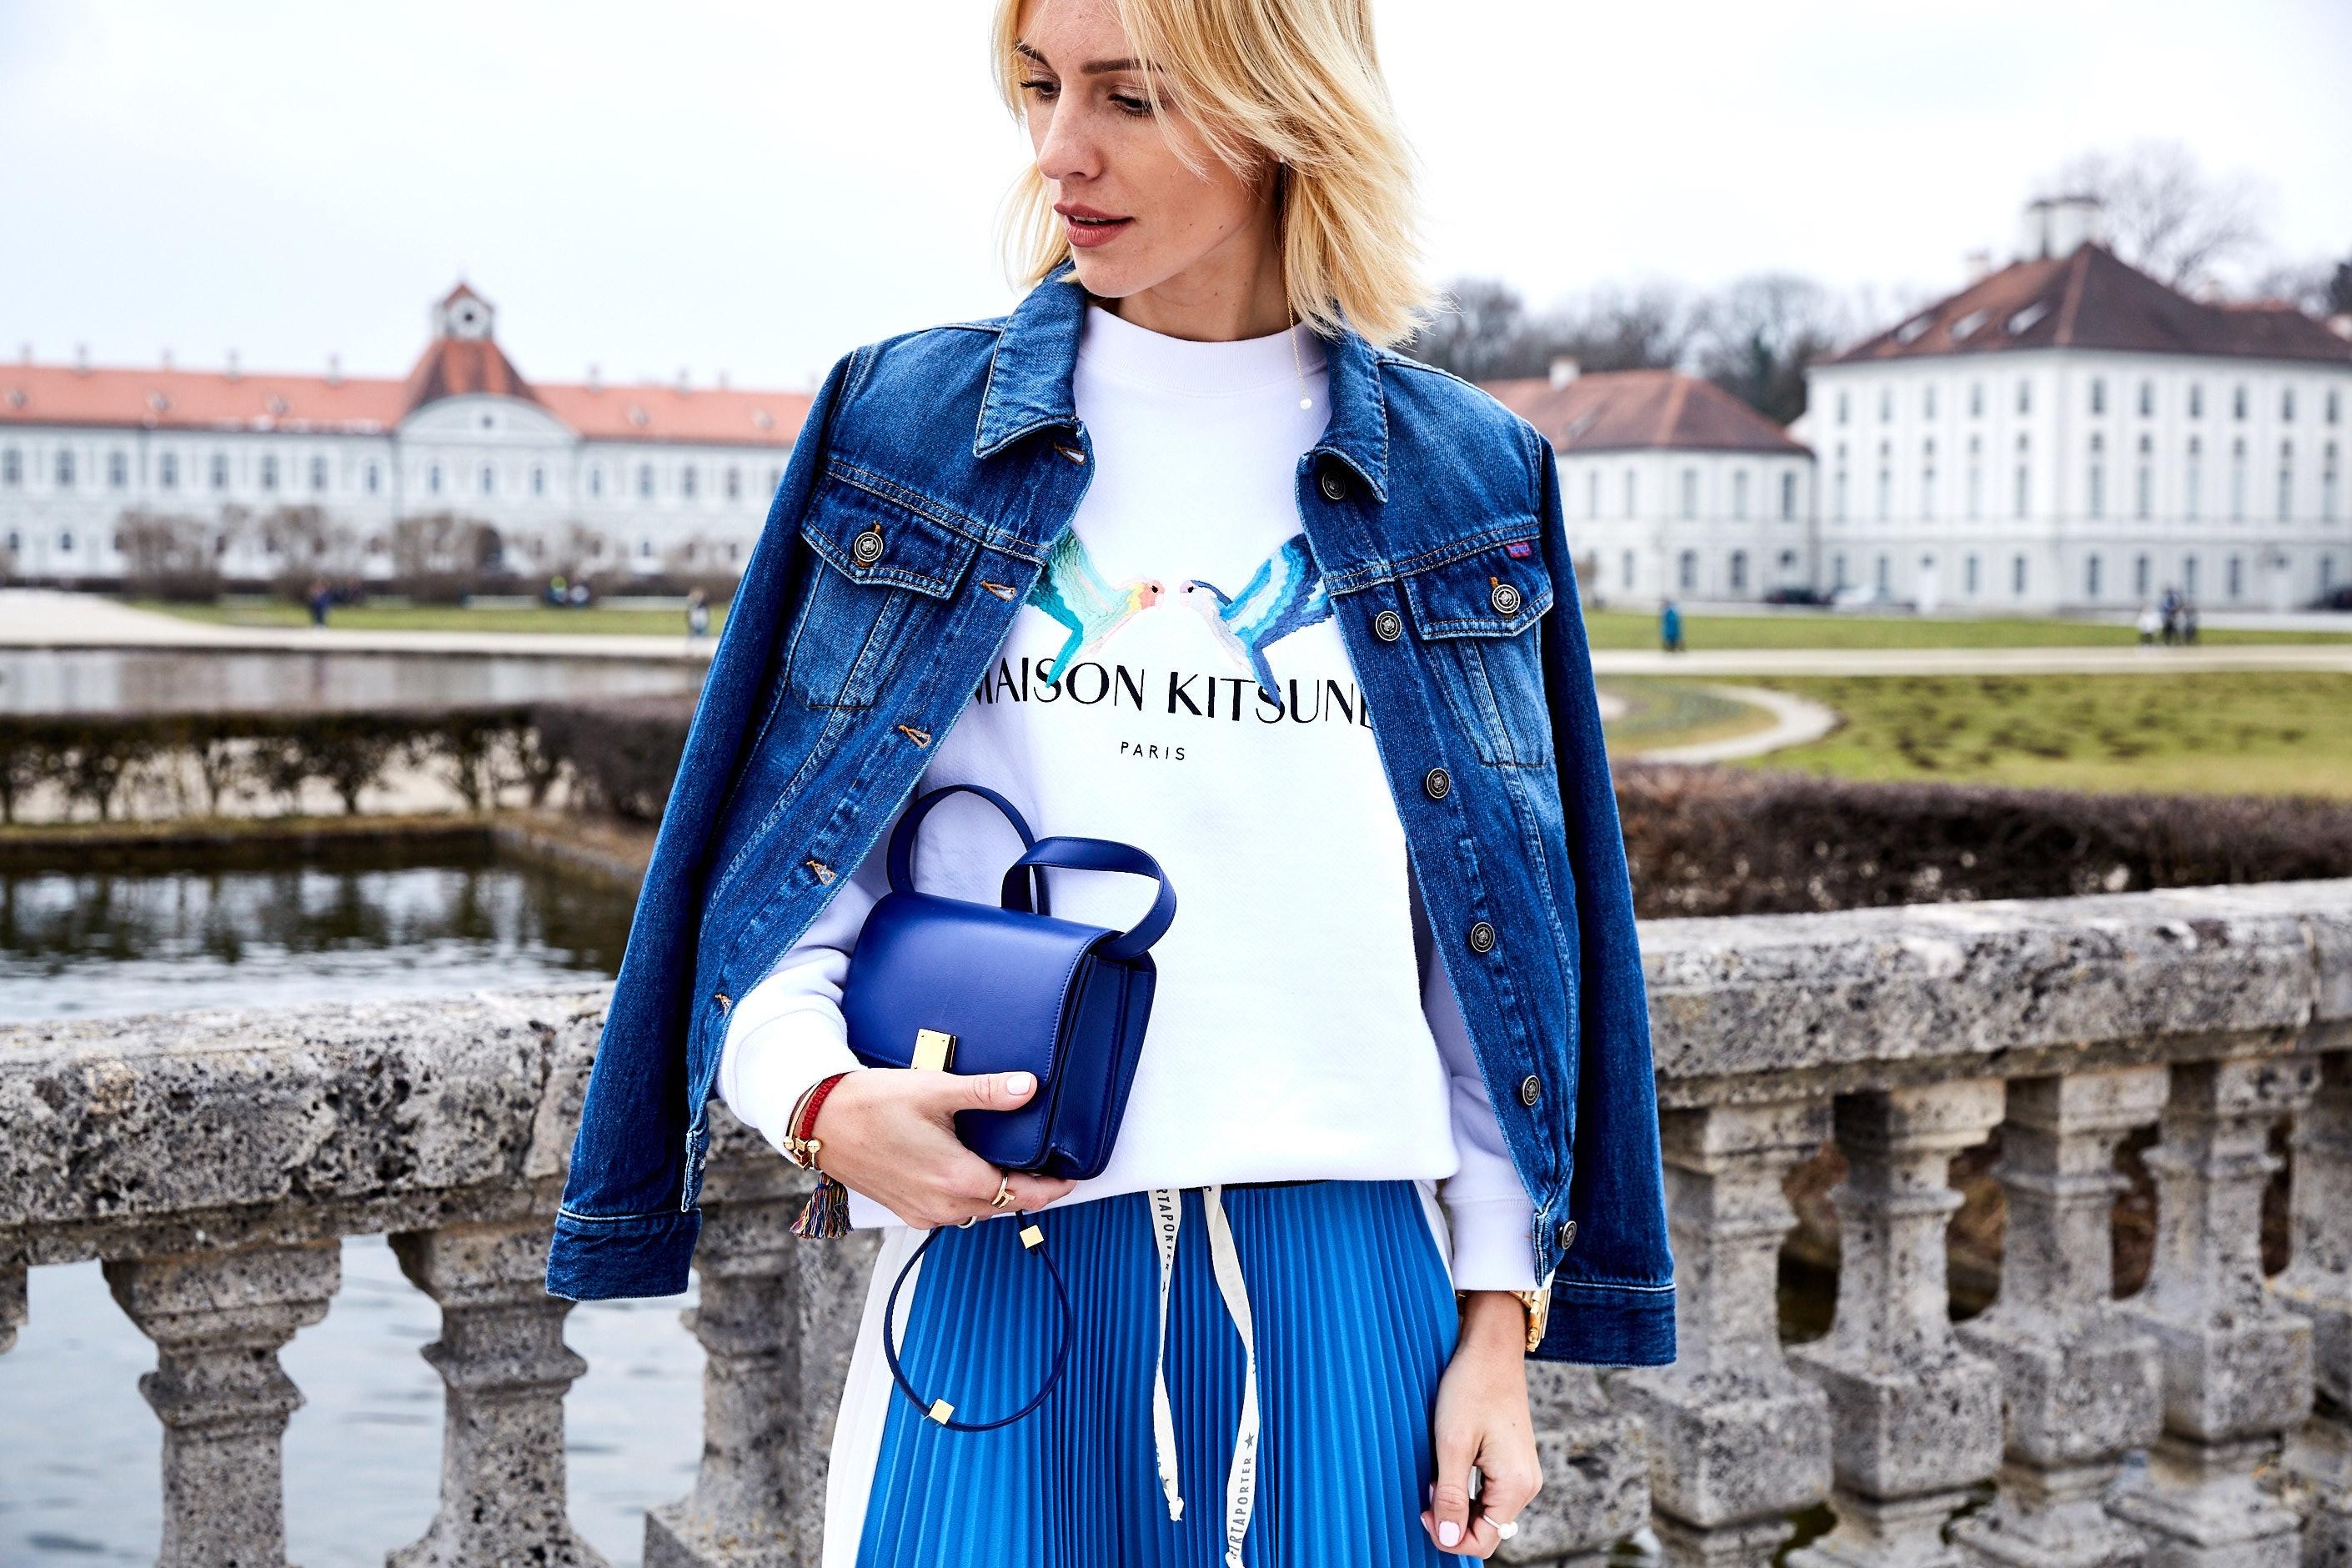 Glam-o-meter, Viktoria Rader, Spring Looks, Lodenfrey, Munich